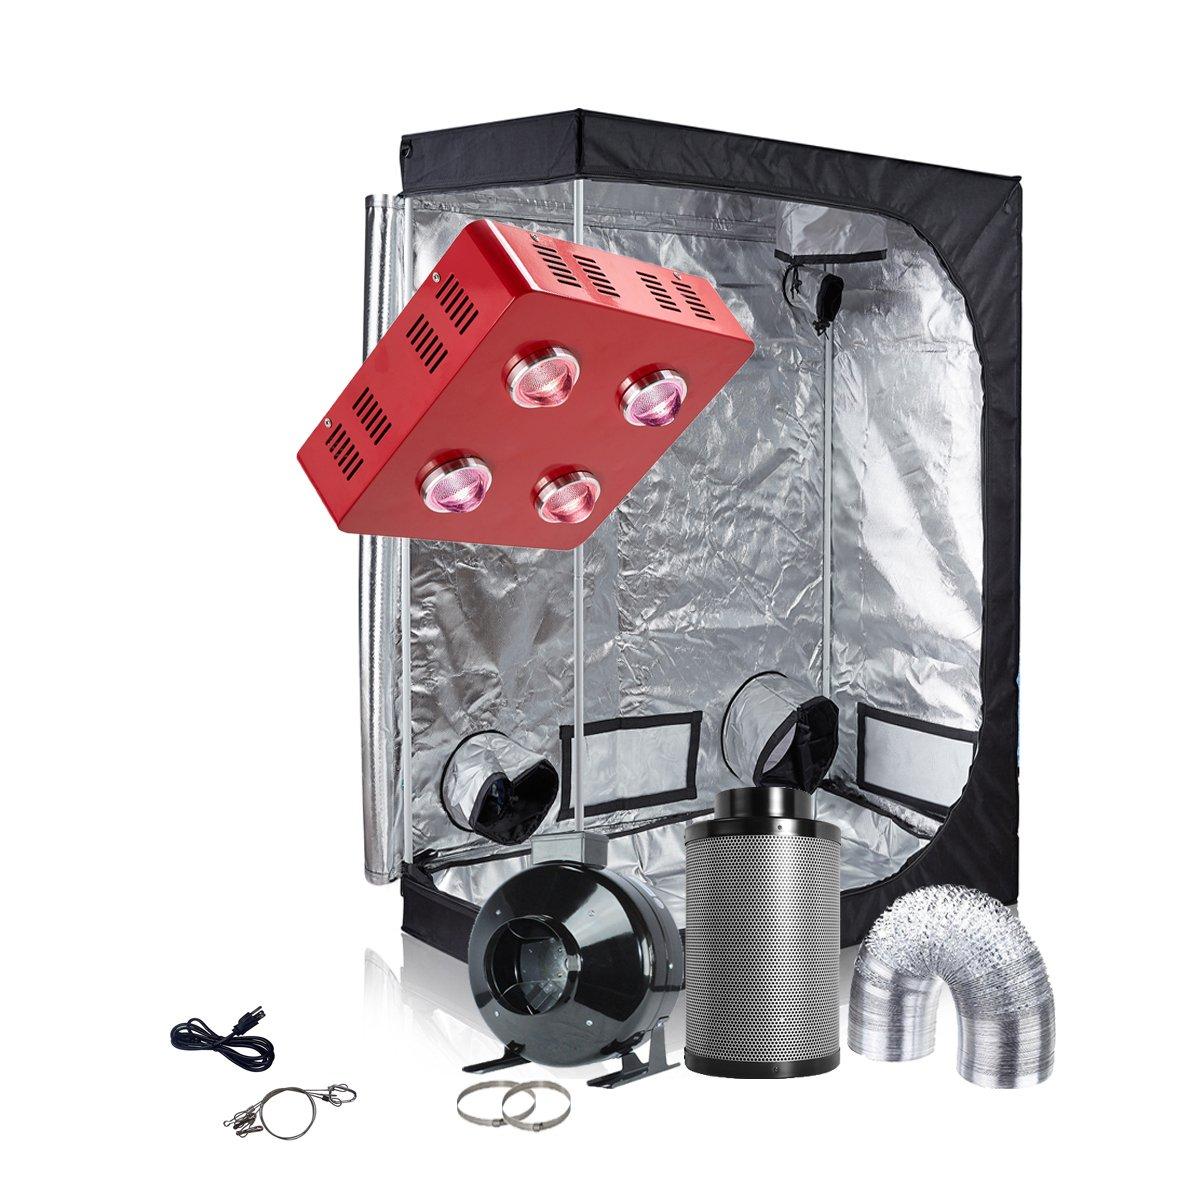 TopoGrow LED Grow Tent Complete Kit LED 800W COB LED Grow Light Kit +60''X32''X80'' Indoor Grow Tent + 6'' Fan&Filter&Ducting Combo Hydroponics Tent System (LED 800W COB, 60''X32''X80''+6'')